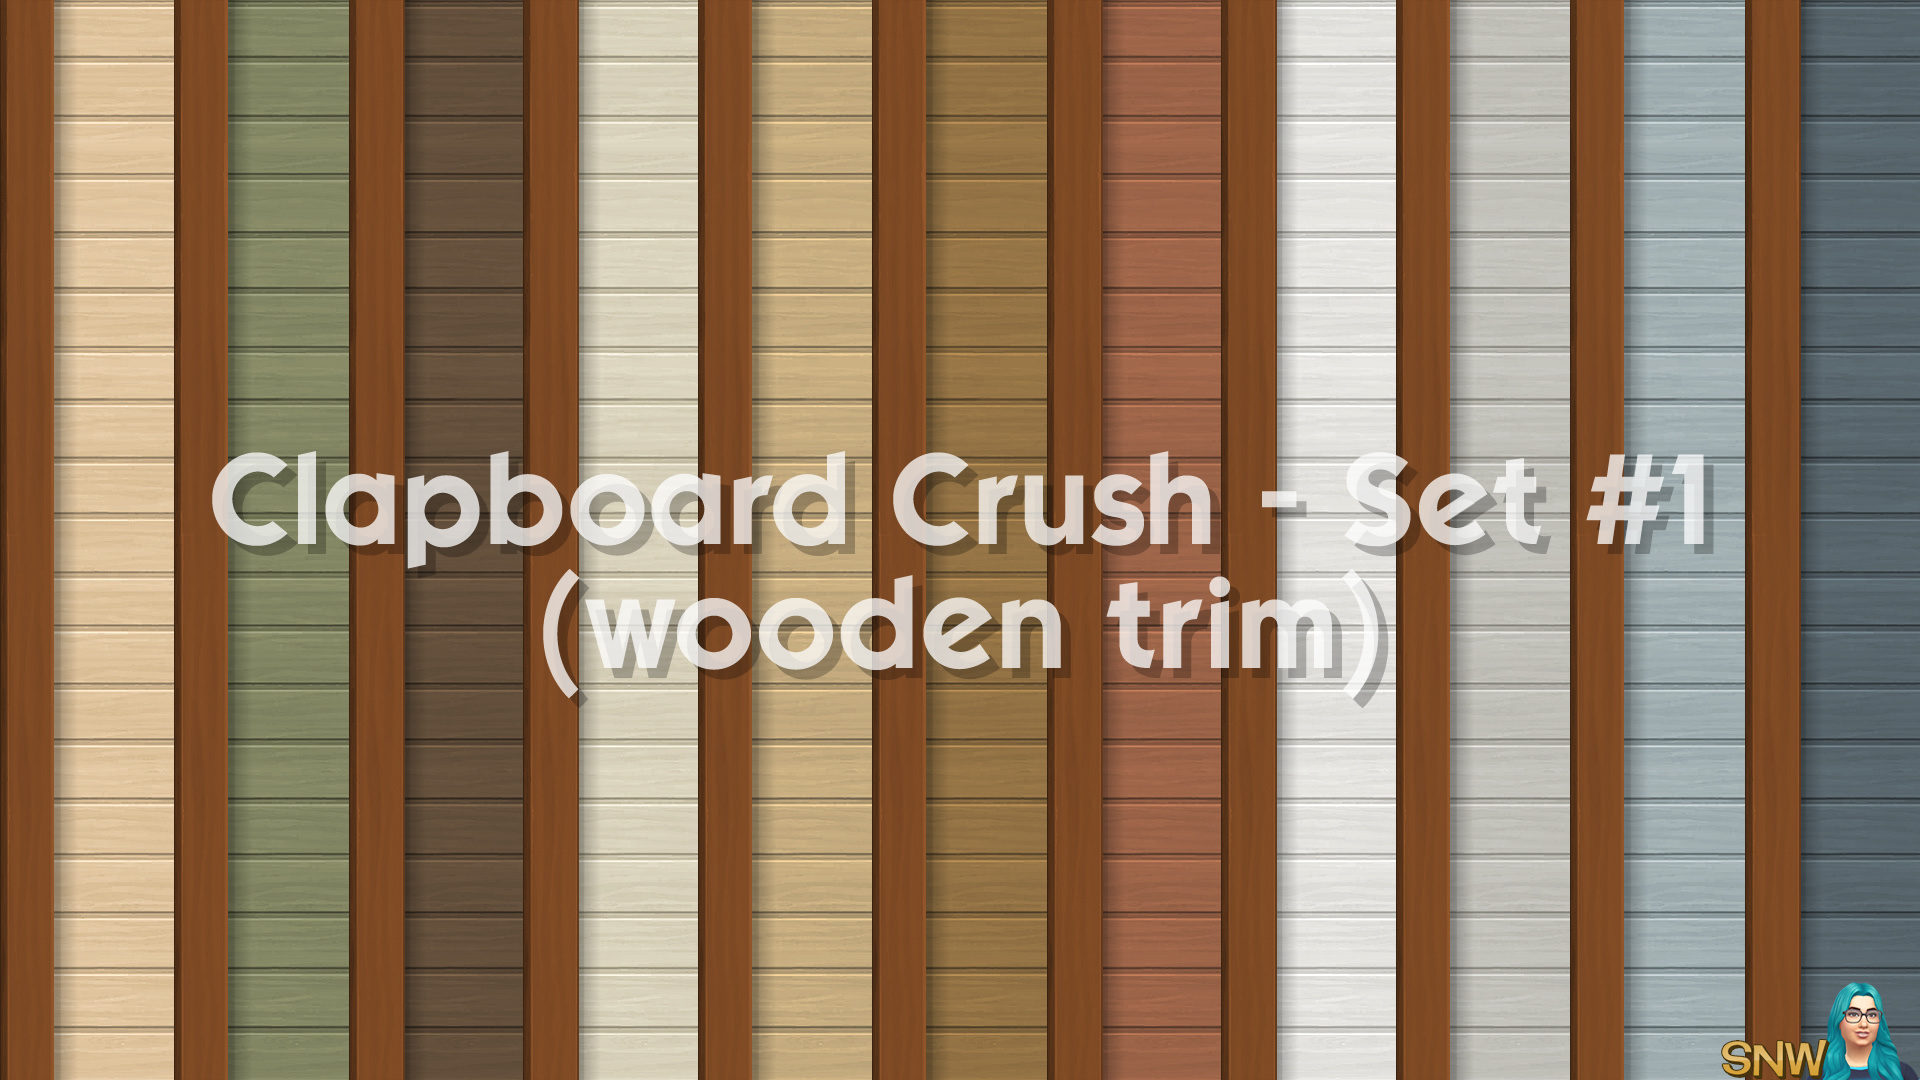 Clapboard Crush Siding Walls Set #1 (with Wooden Corner Trim)